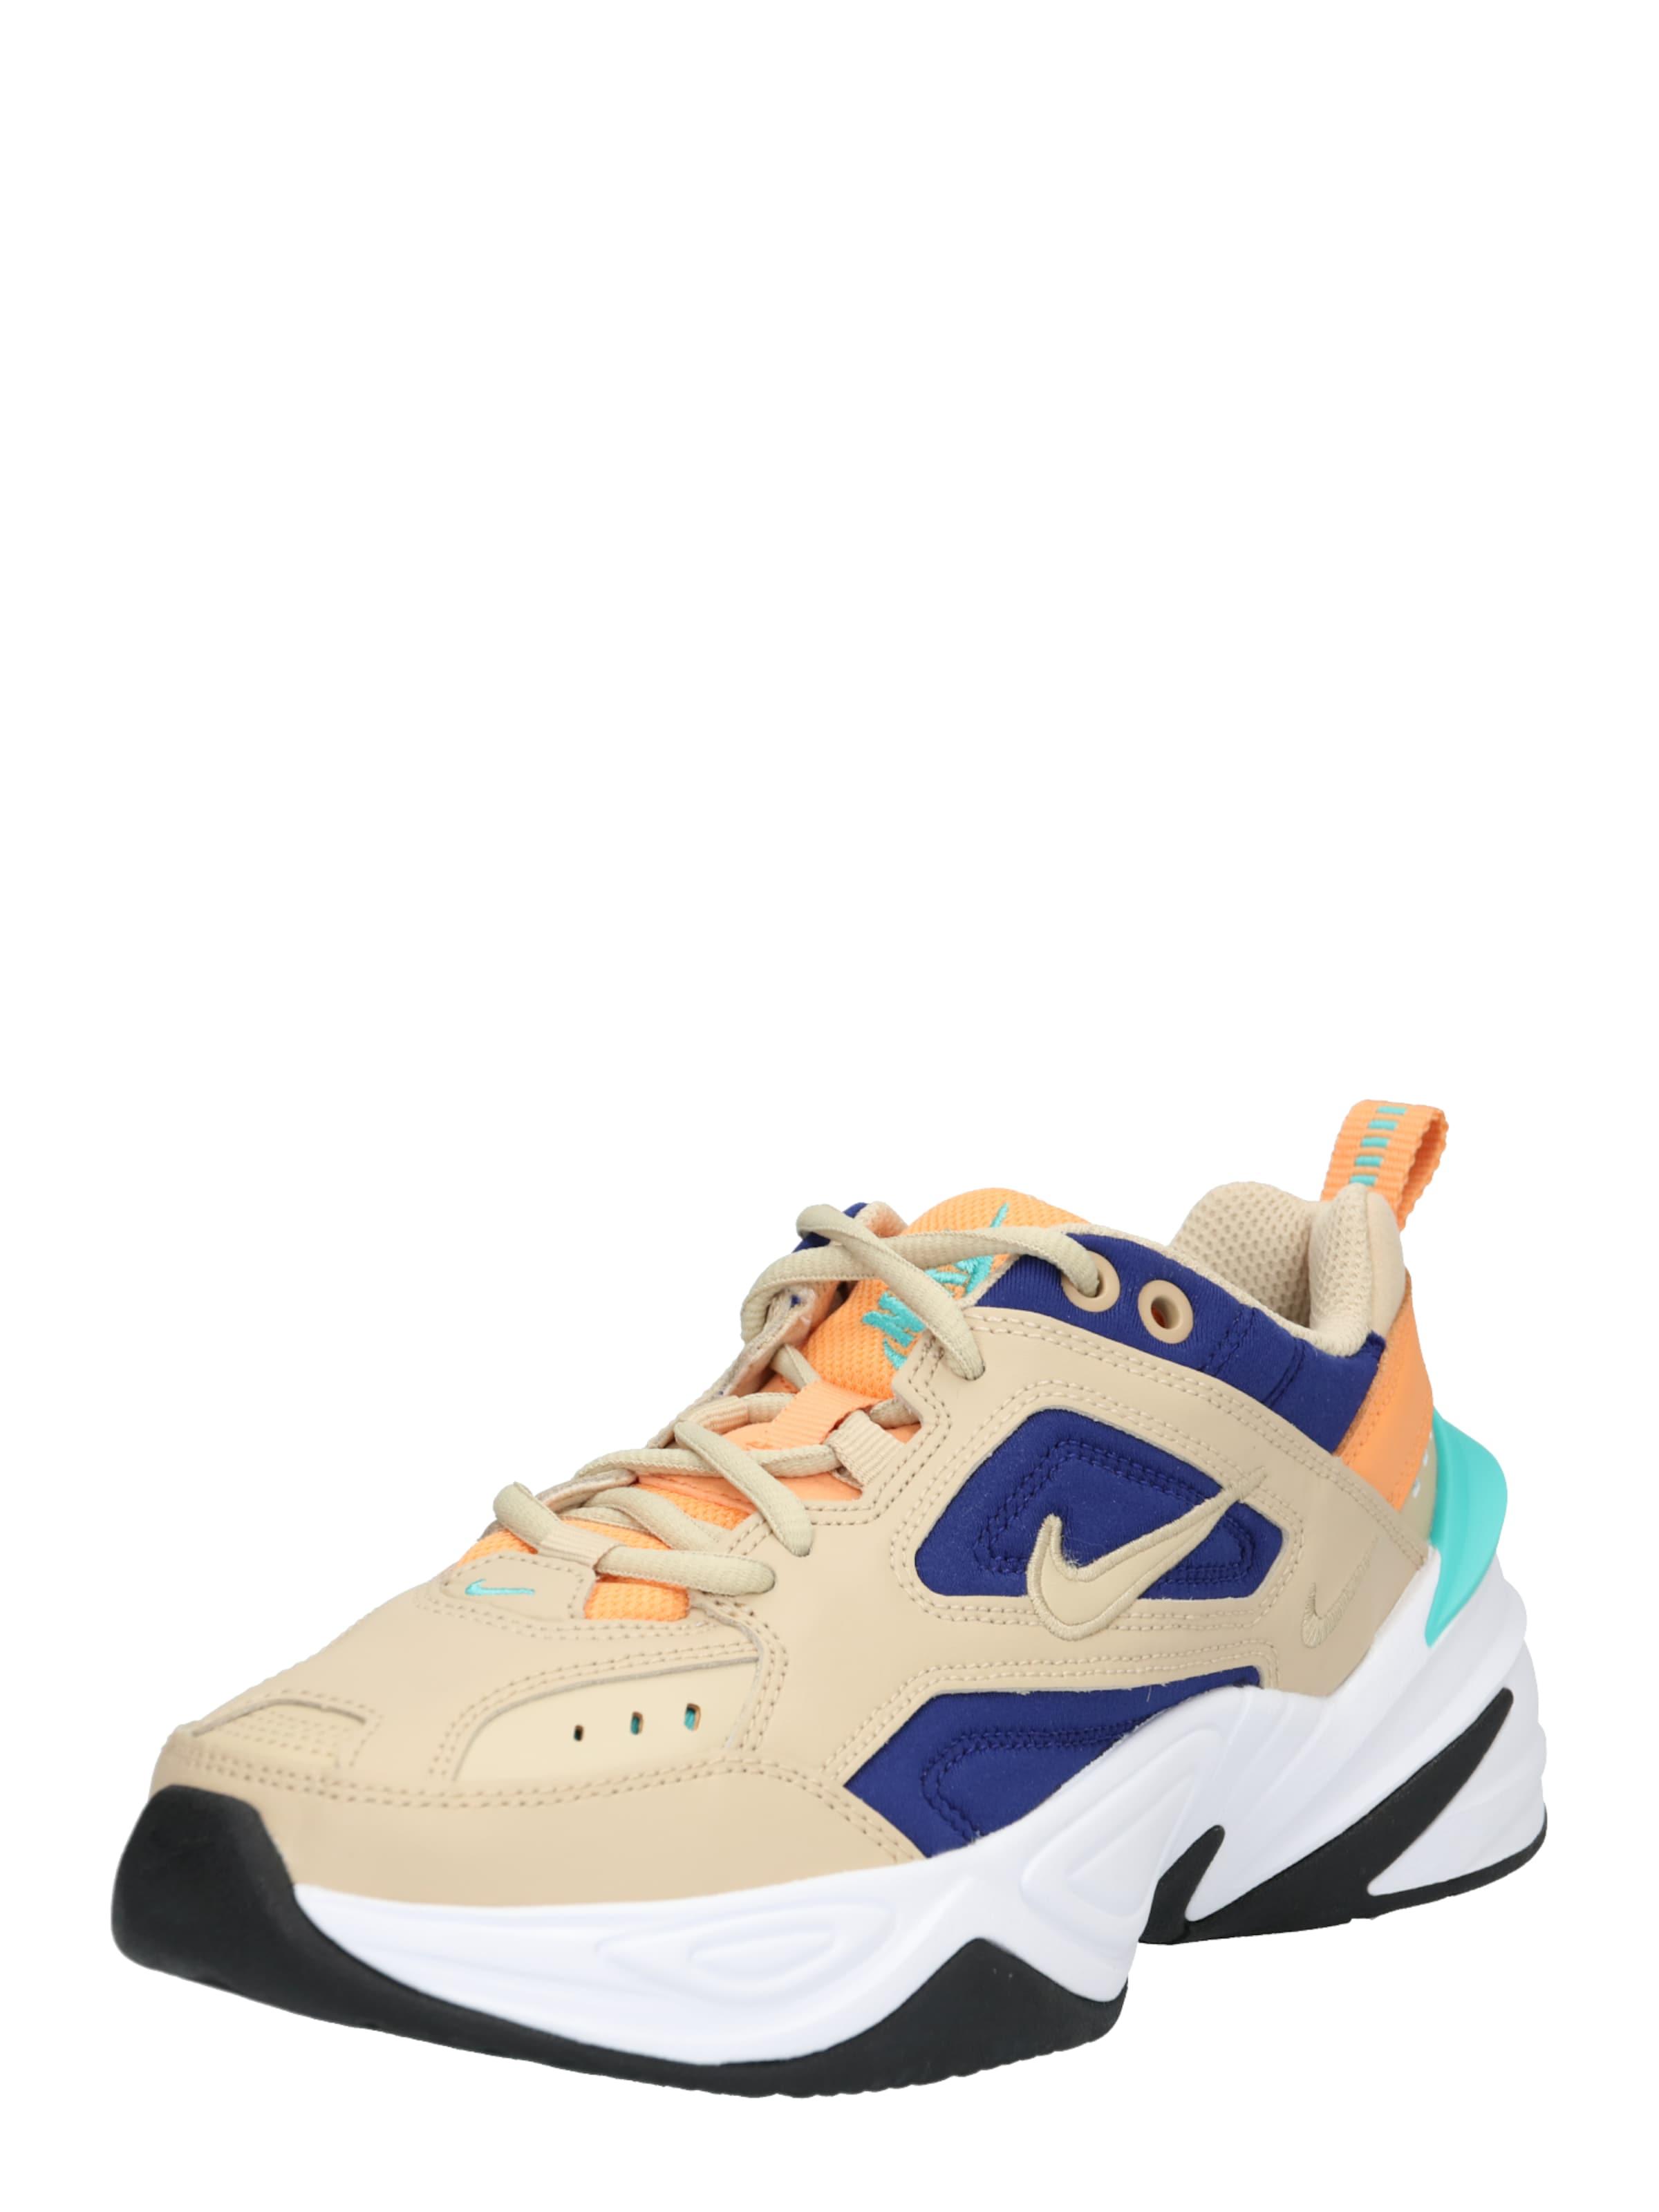 Basses En Nike Sportswear SableMenthe Noir Baskets 'm2k Tekno' sBotdCxrhQ